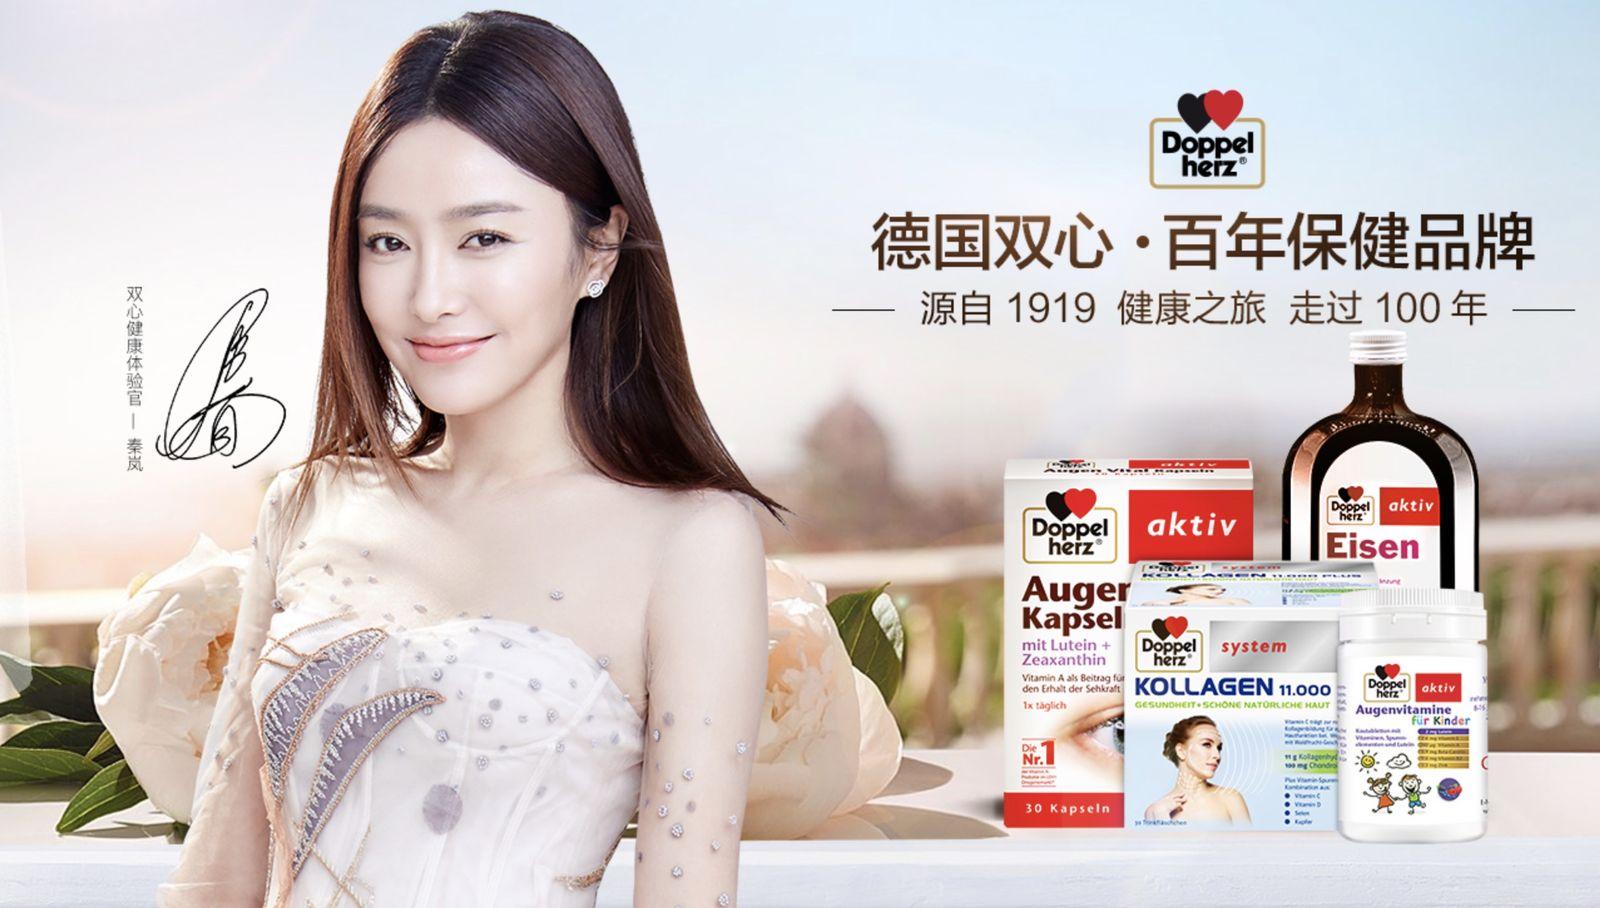 EINMALIGE VERWENDUNG shuangxin.tmall.hk / Alibaba Doppelherz